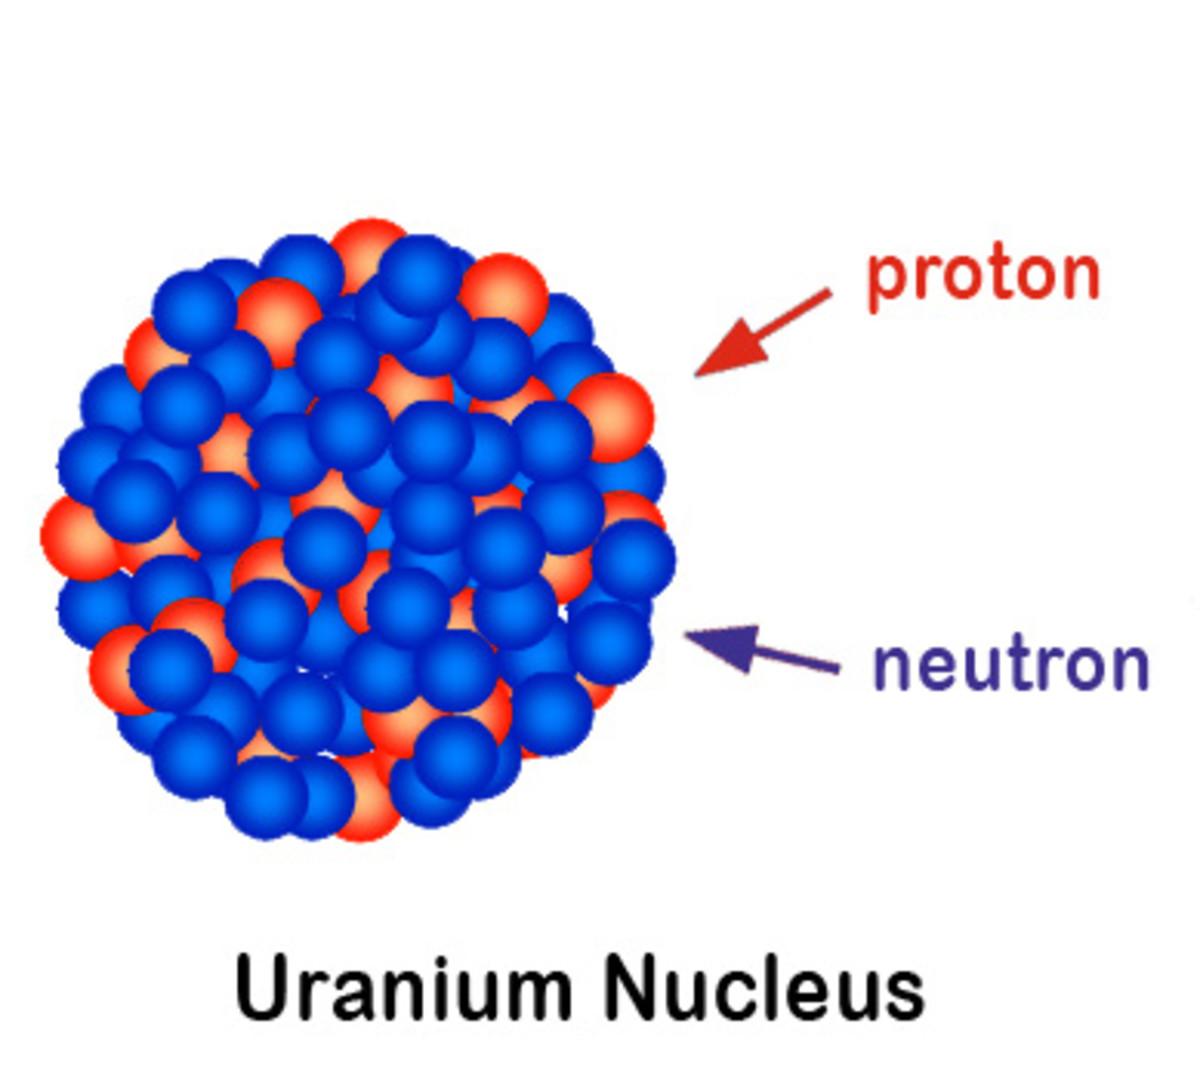 Nucleus Of An Atom